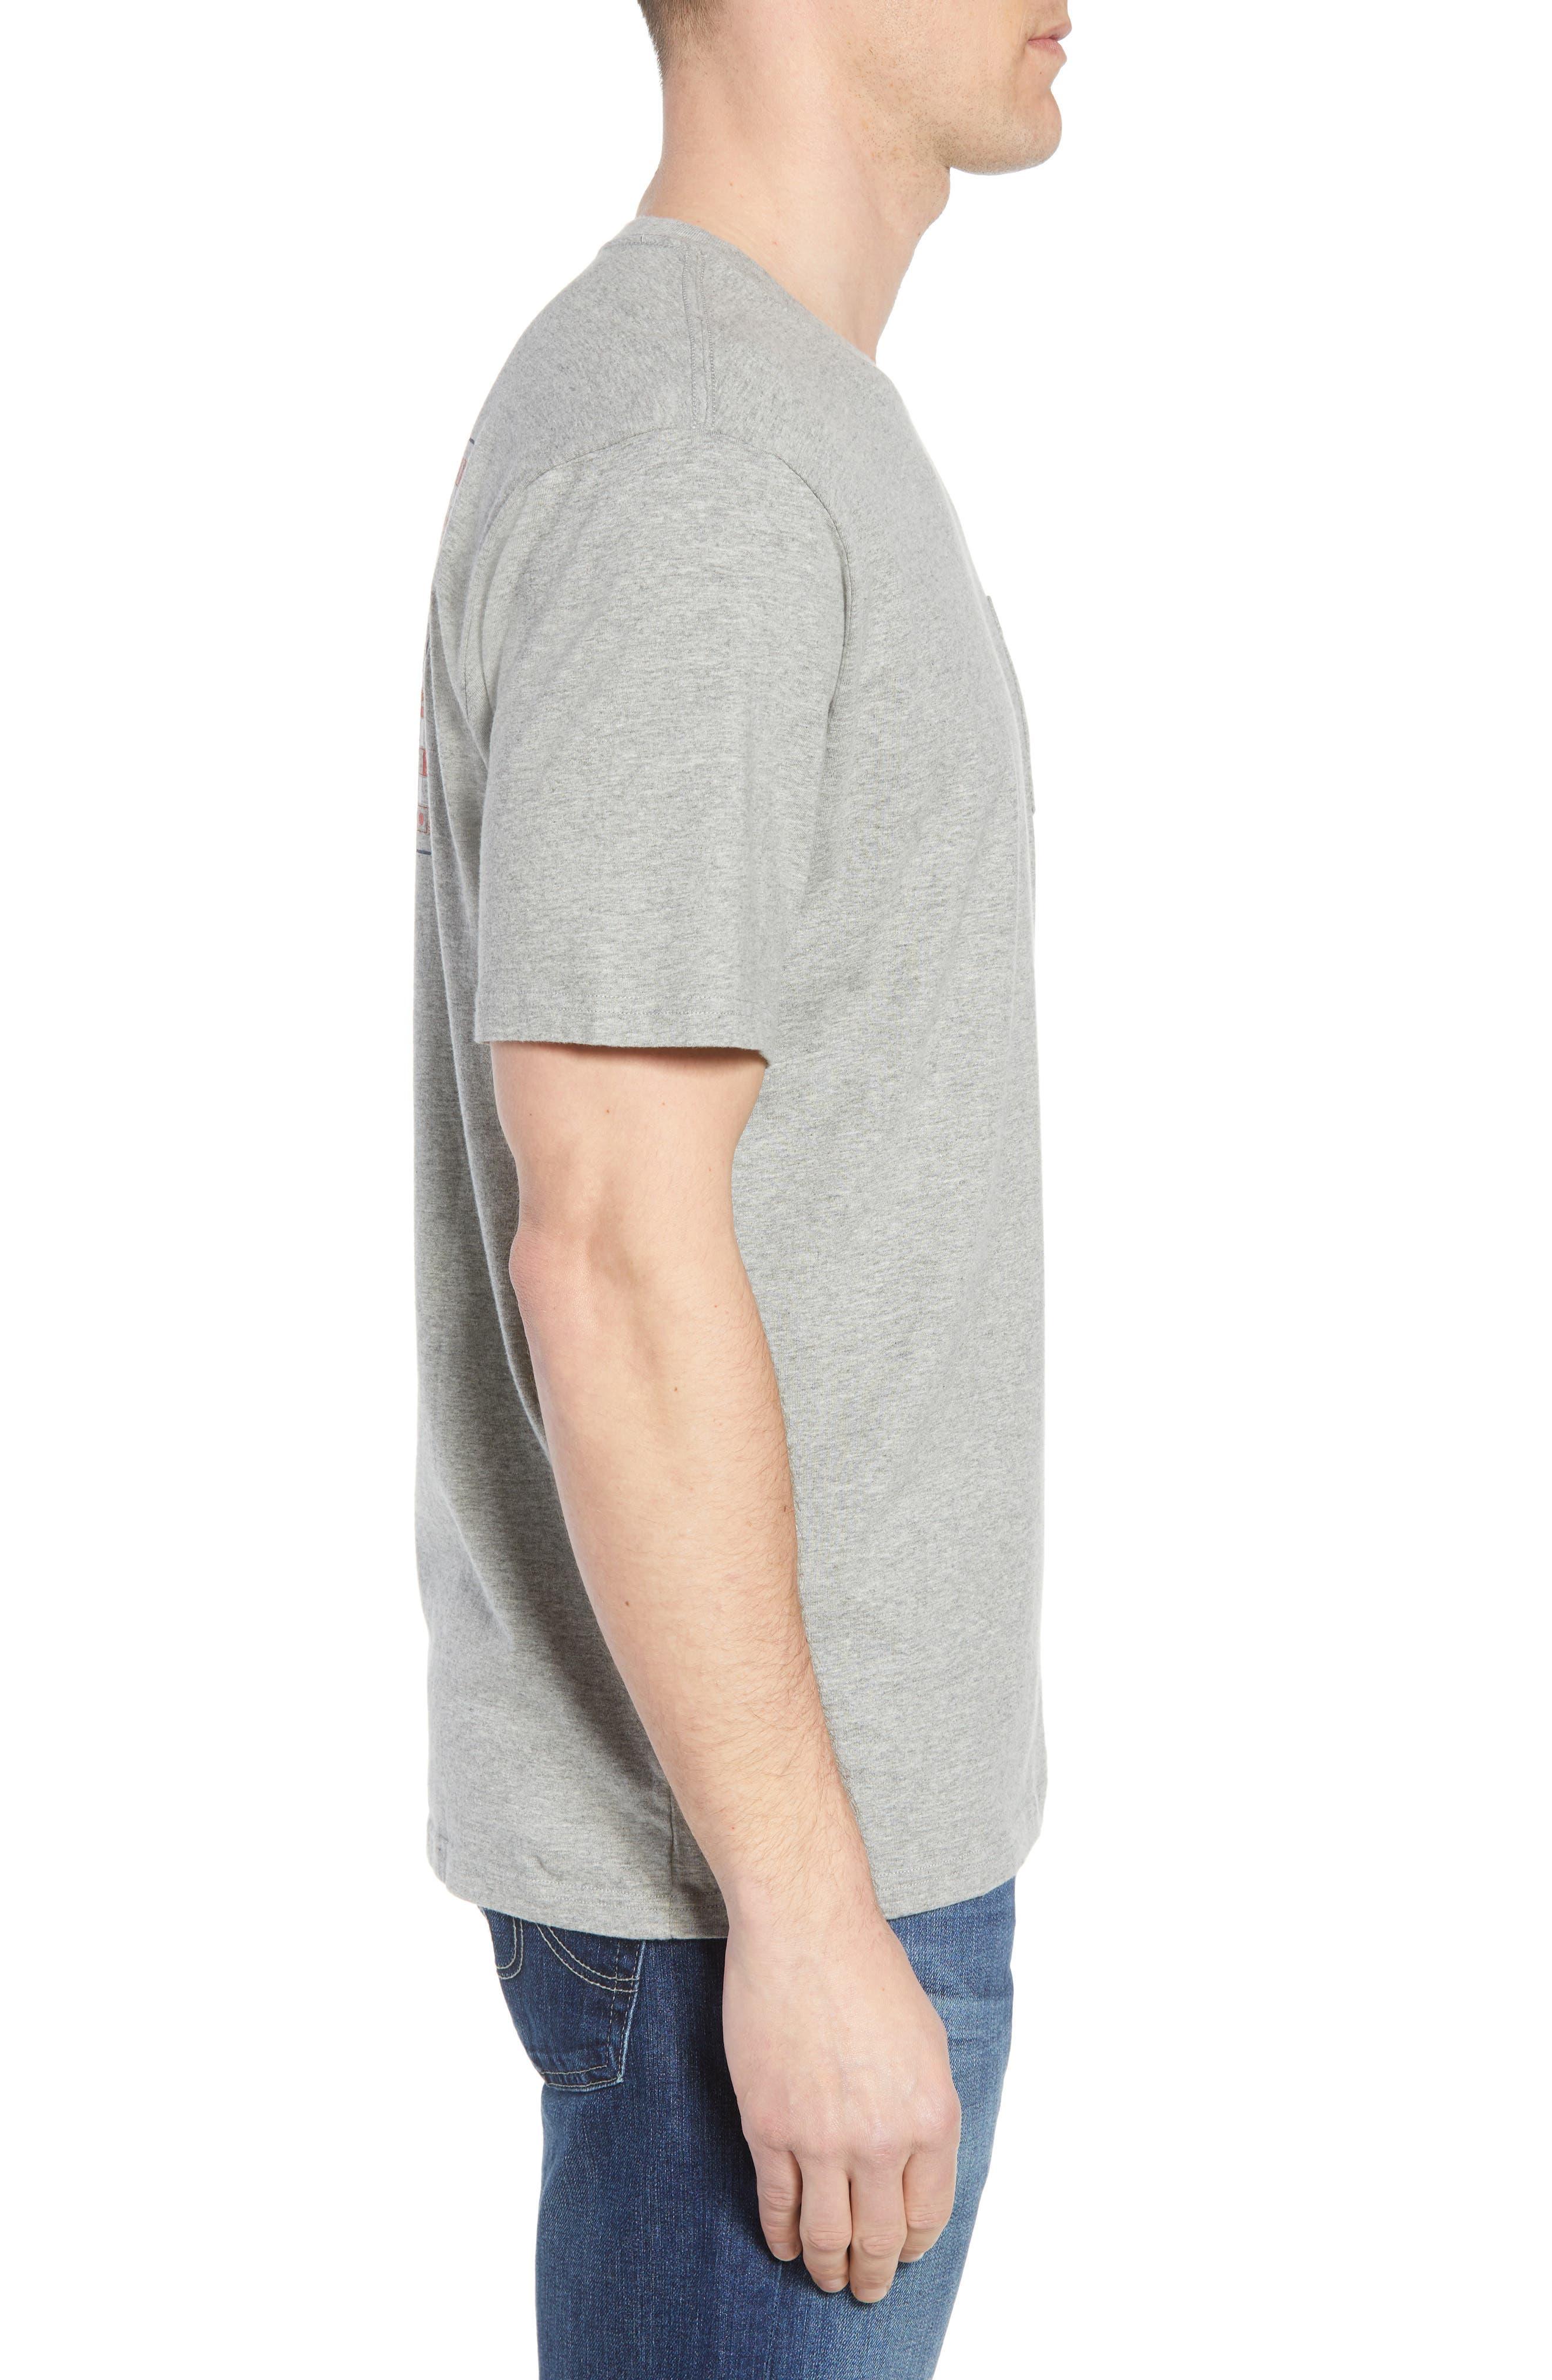 We the People Regular Fit T-Shirt,                             Alternate thumbnail 3, color,                             Grey